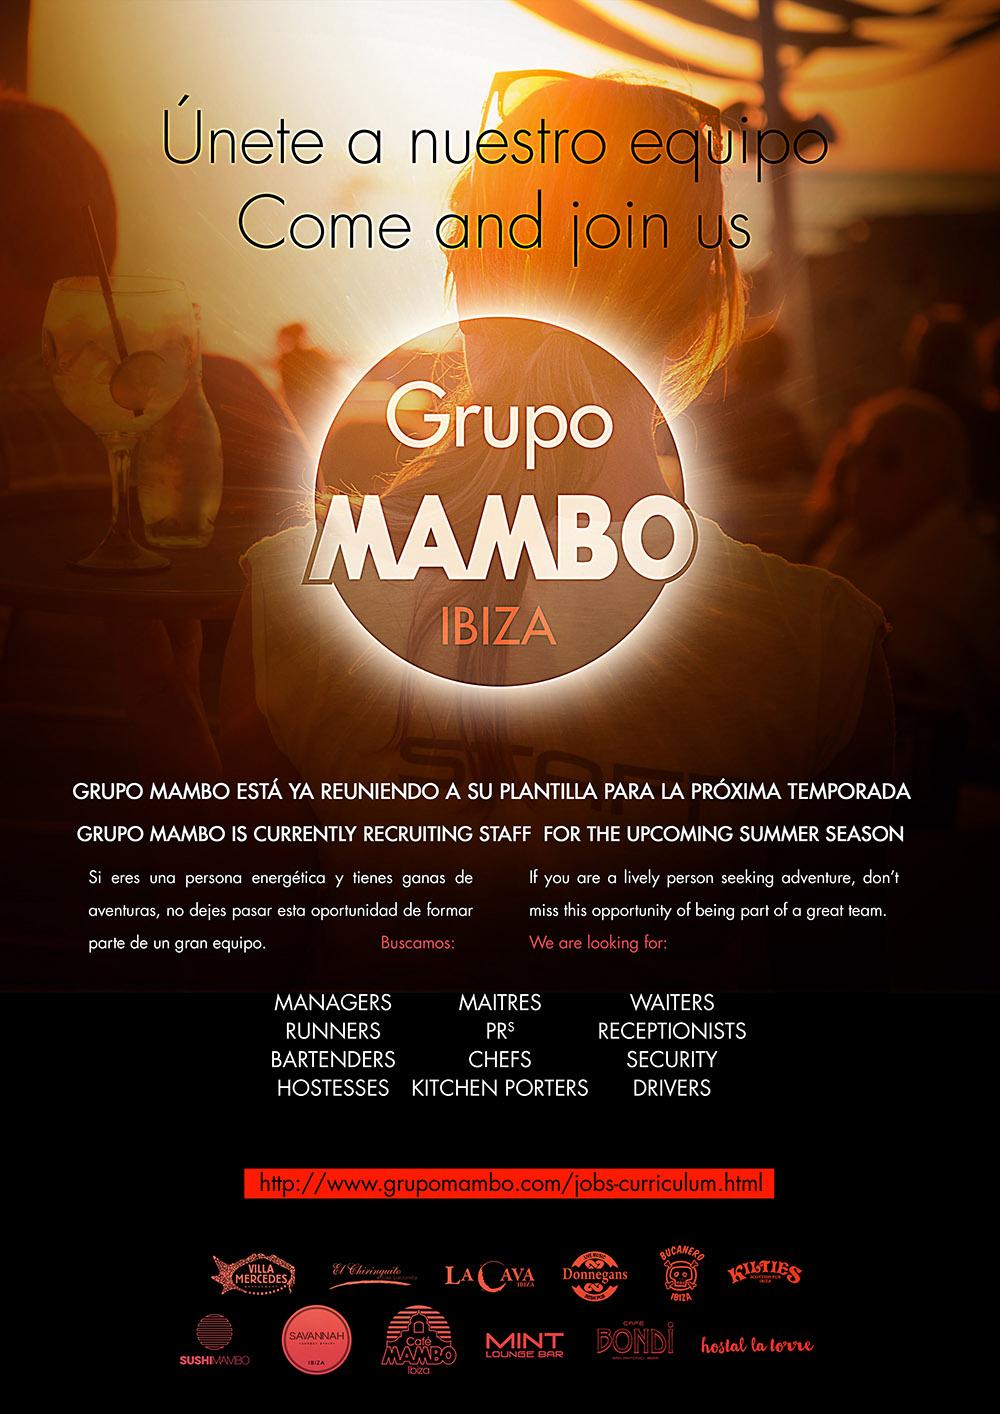 trabajo-mambo-2016-welcome-to-ibiza